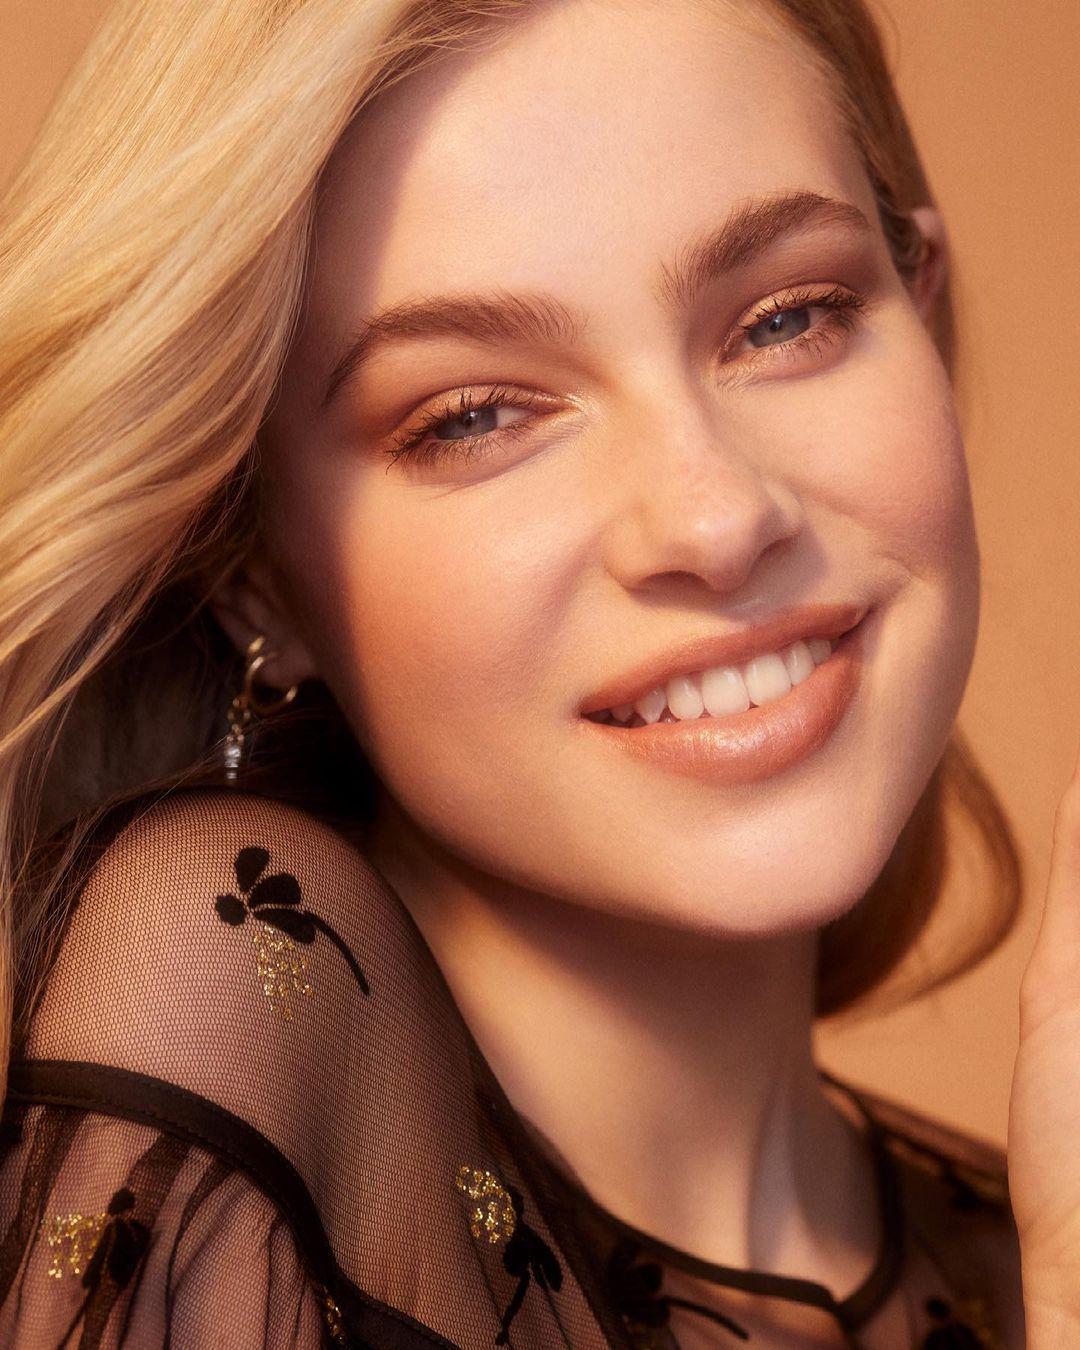 Dangerous ☢️ Habits Causing Your Acne 😷 to Worsen 👎🏼 ...